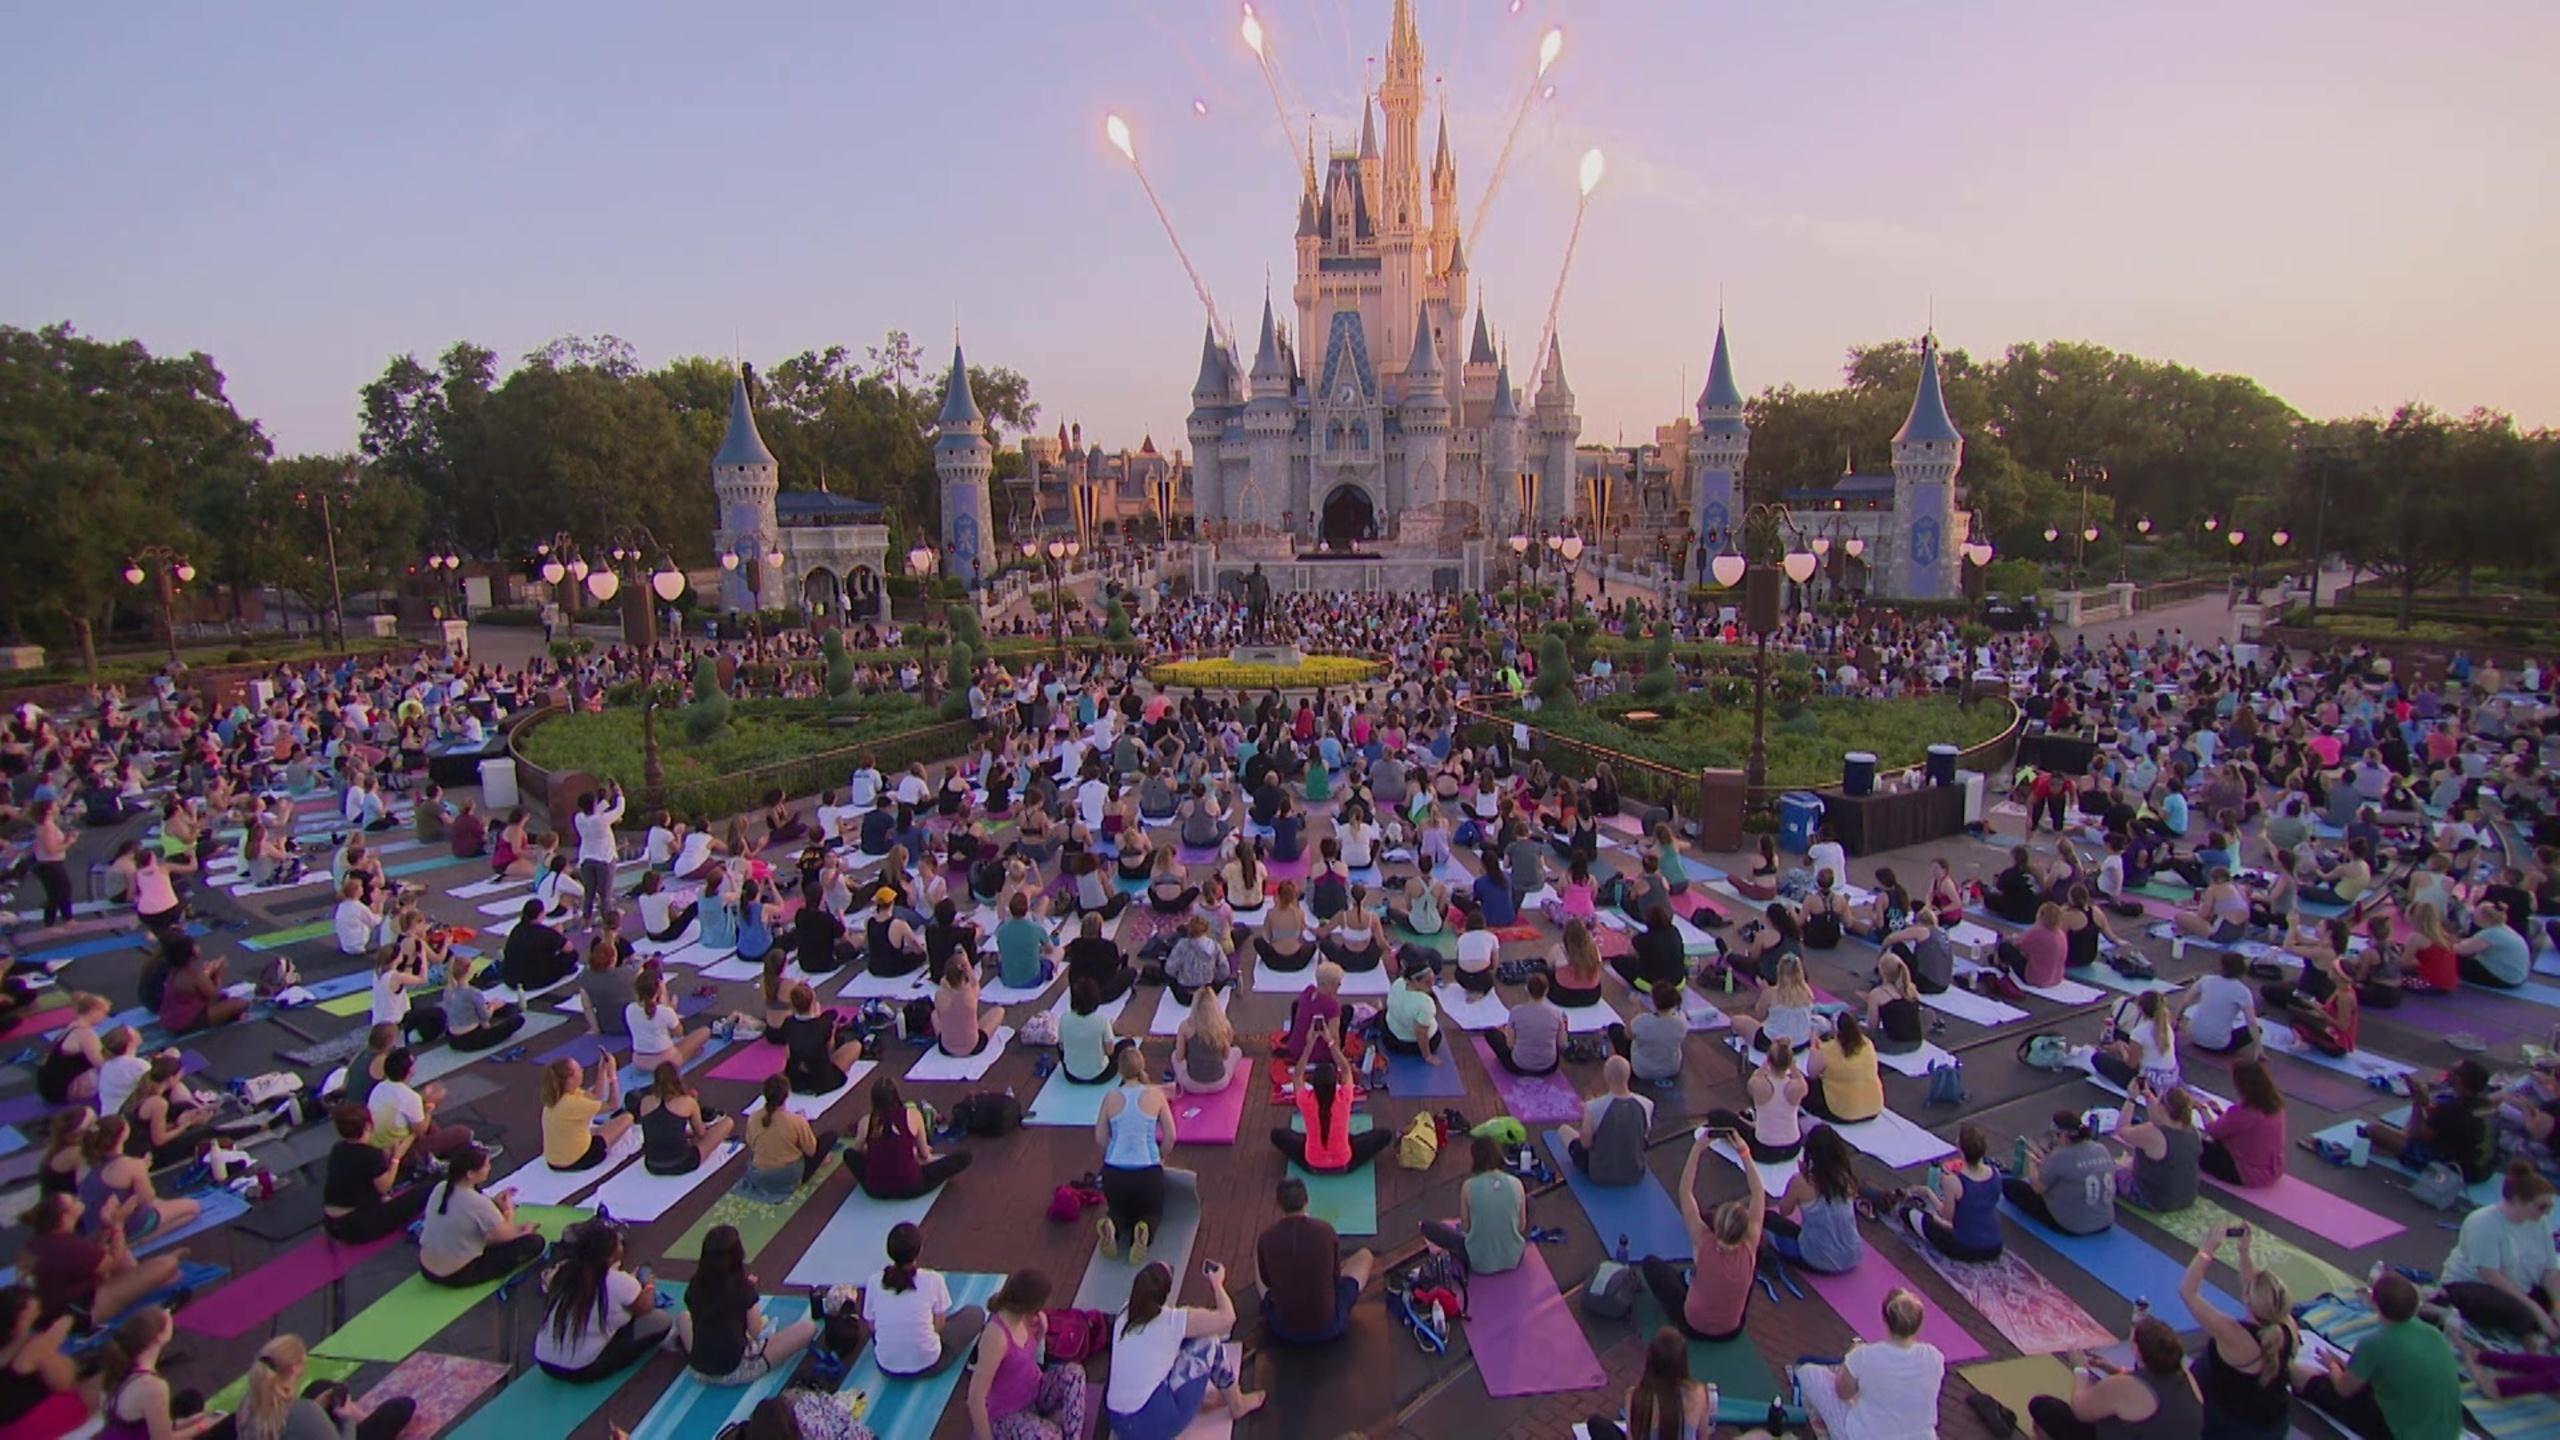 Thousands of employees do yoga at Disney's Magic Kingdom